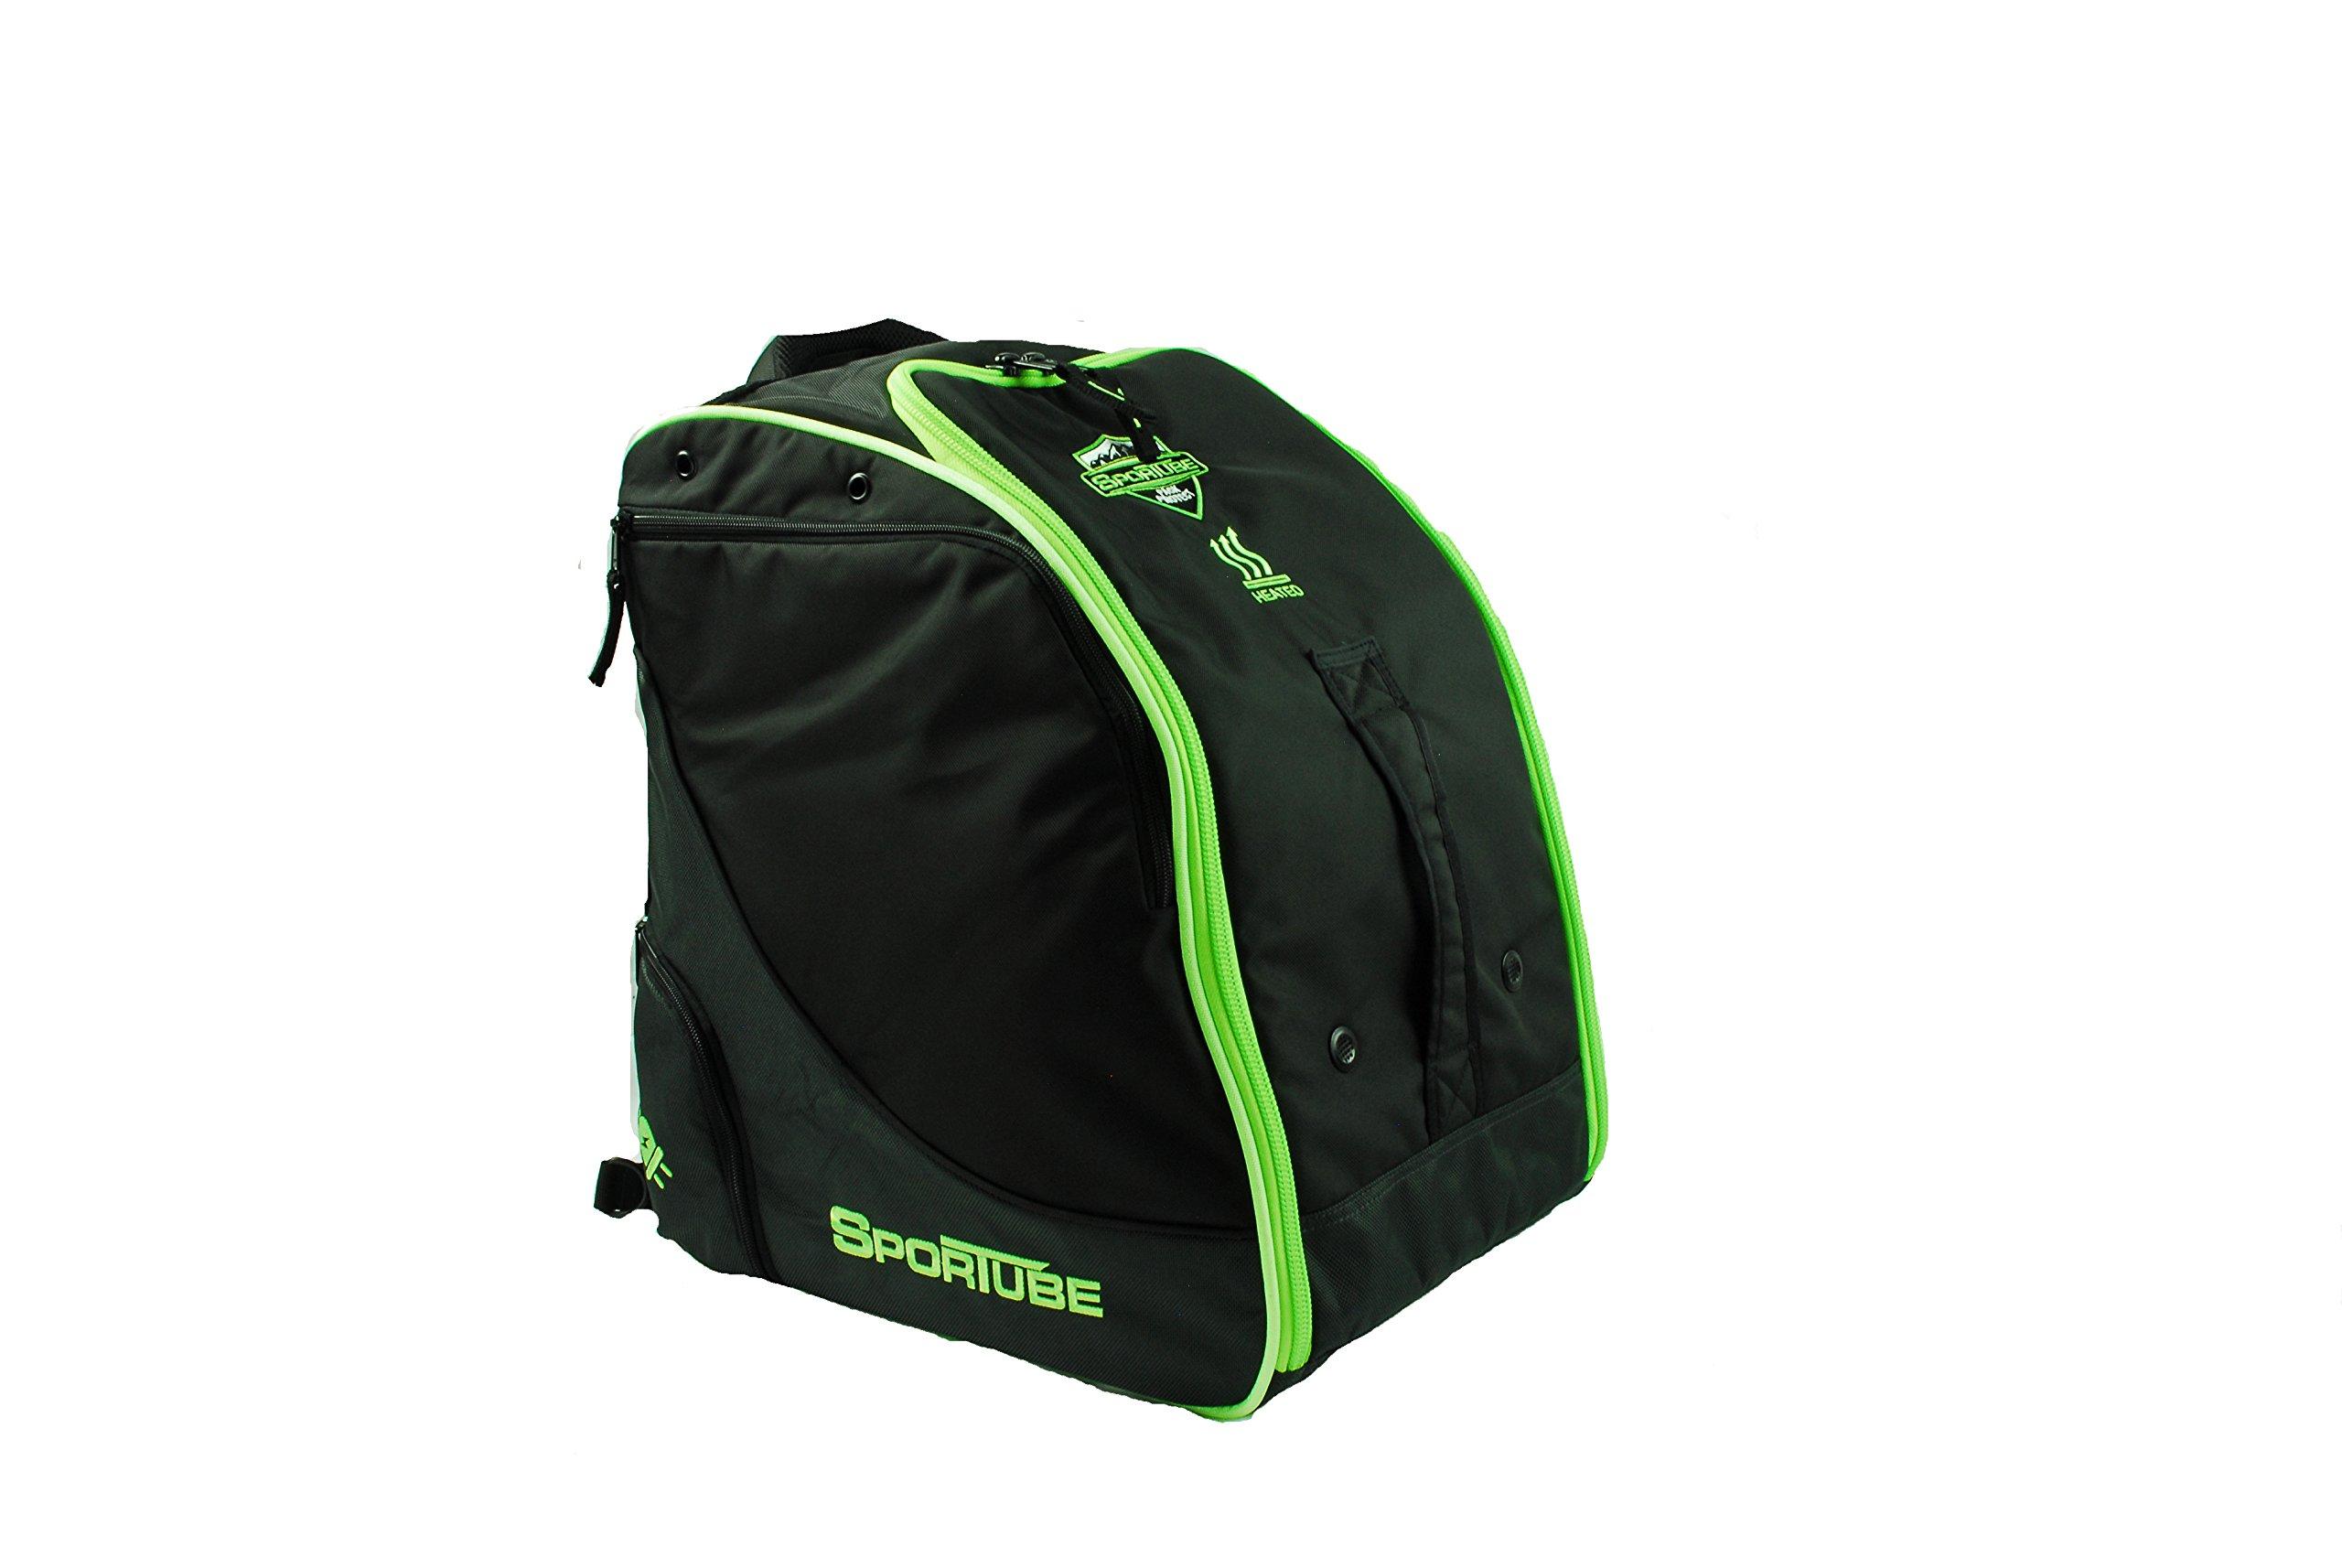 Sportube Toaster Heated Boot Bag, Green by Sportube